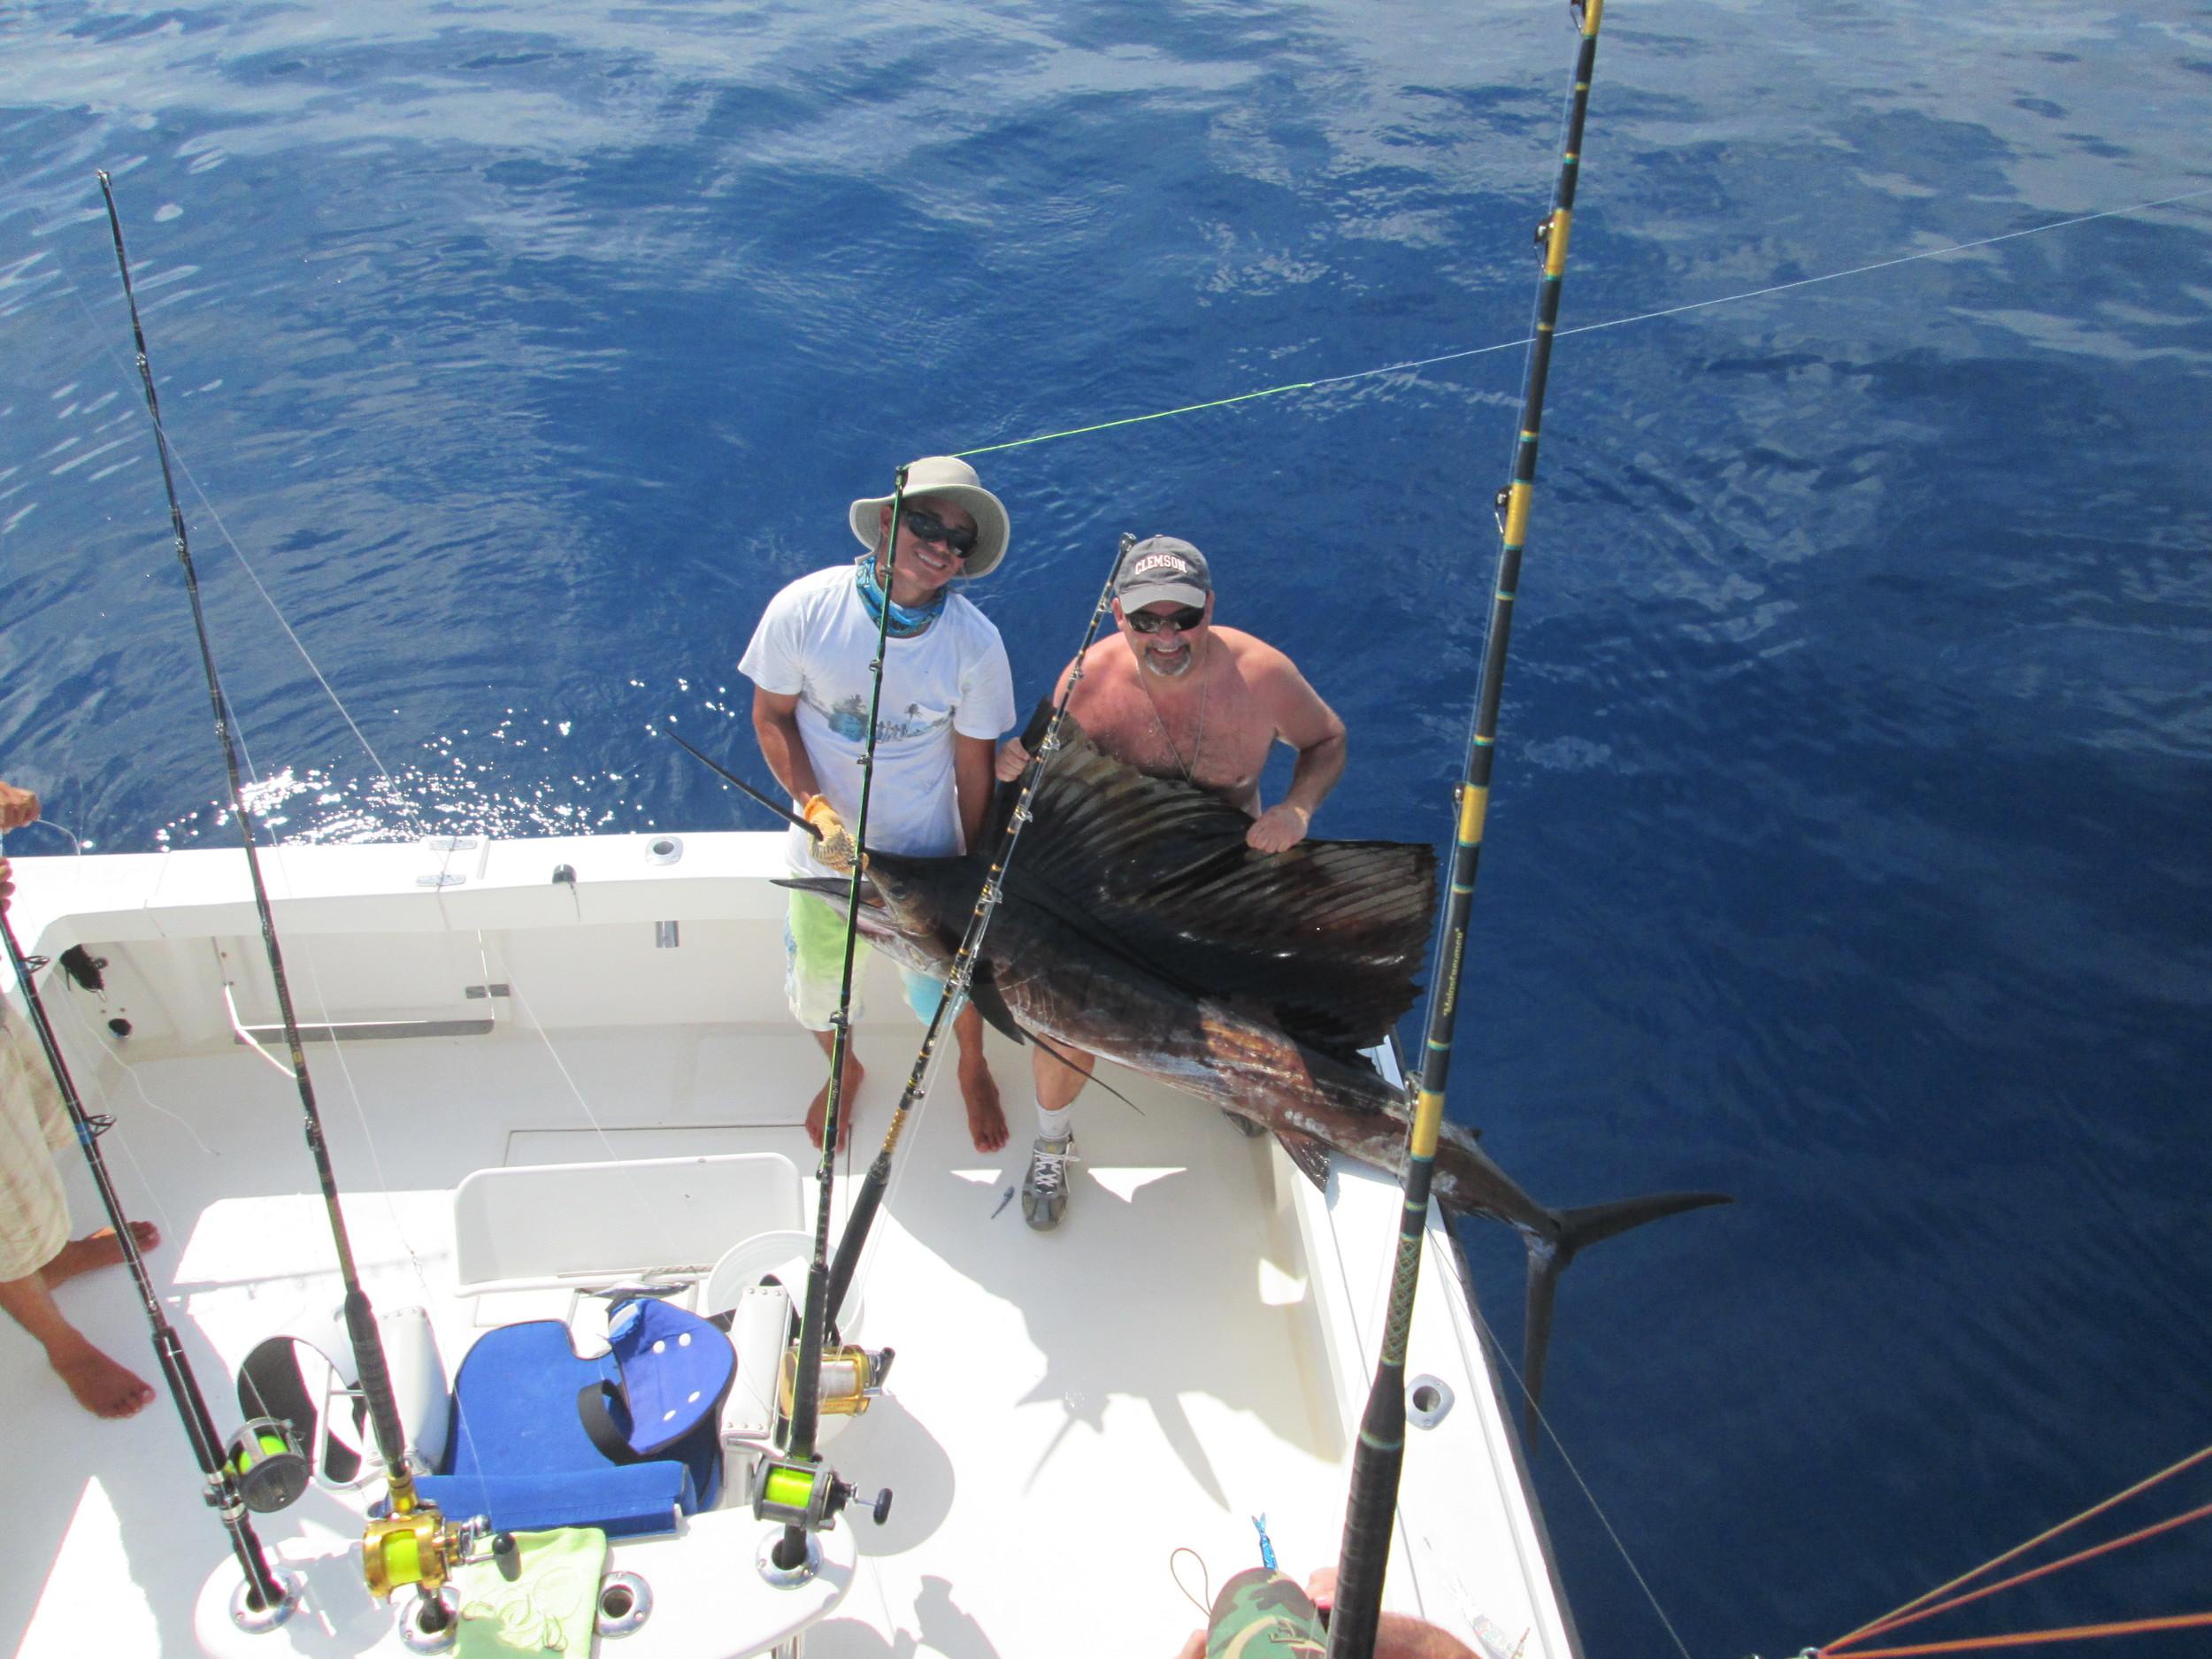 Johnny G. with his sailfish.